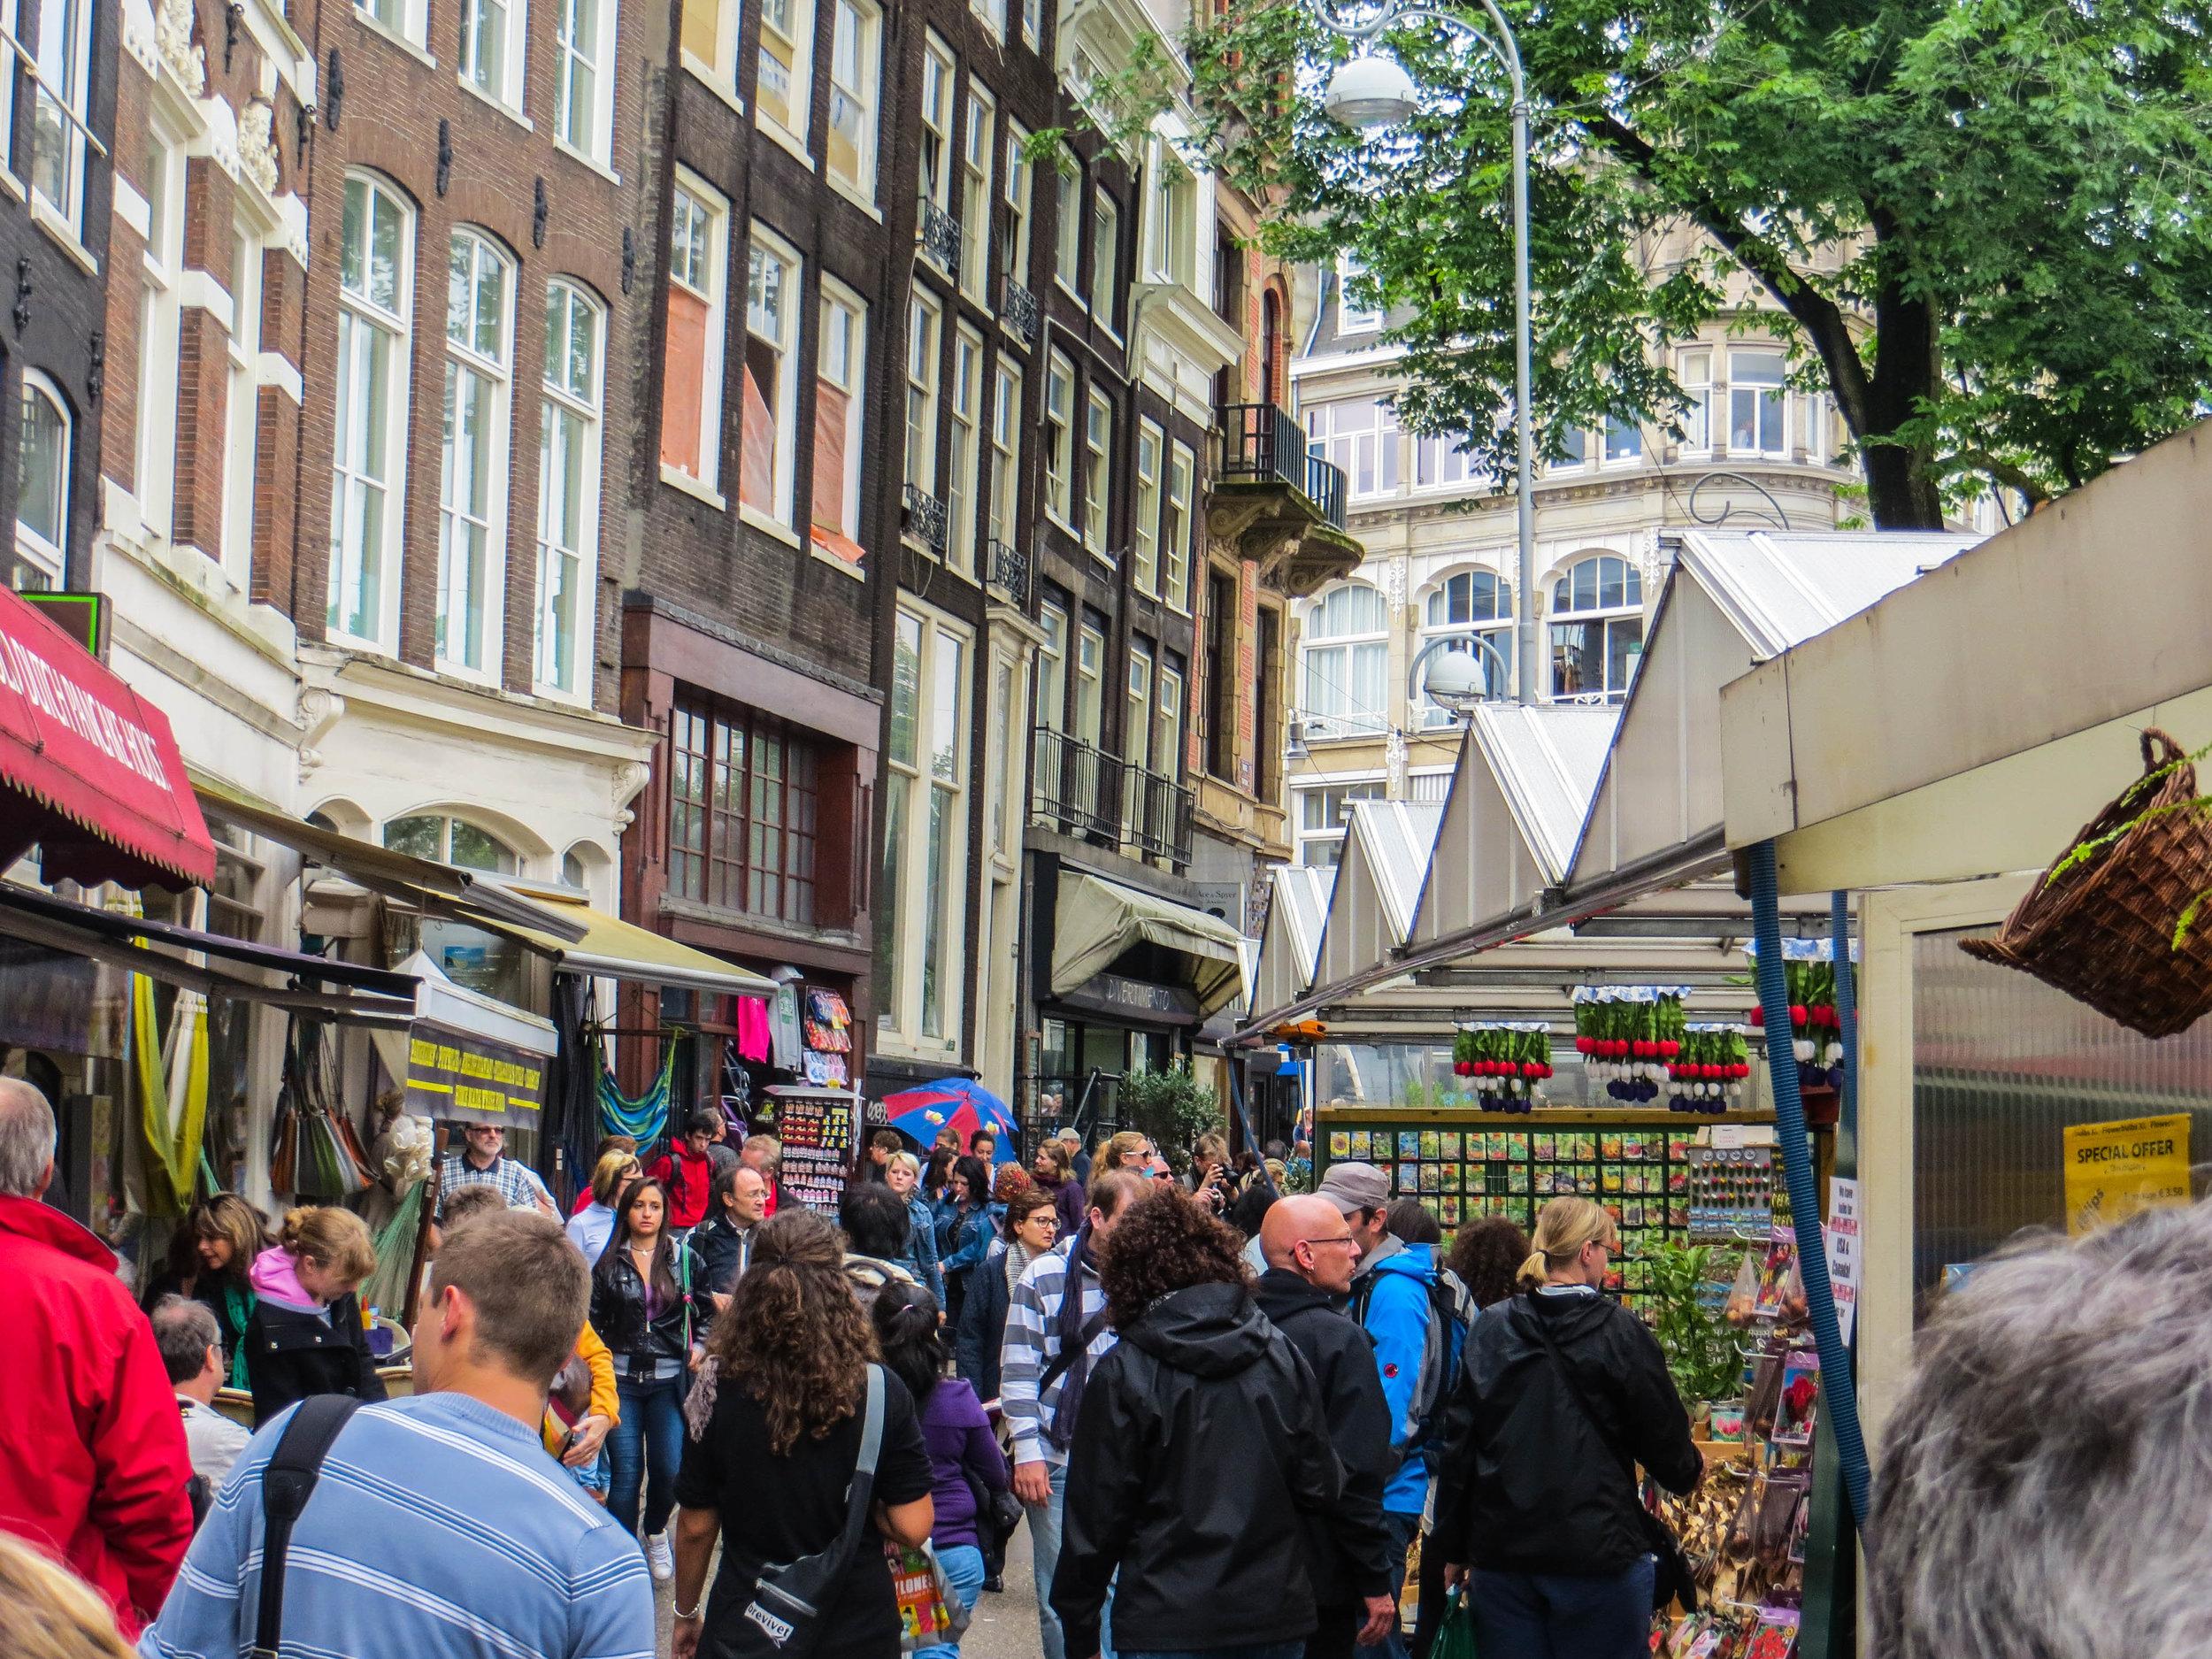 amsterdam-netherlands-street-photography-13.jpg